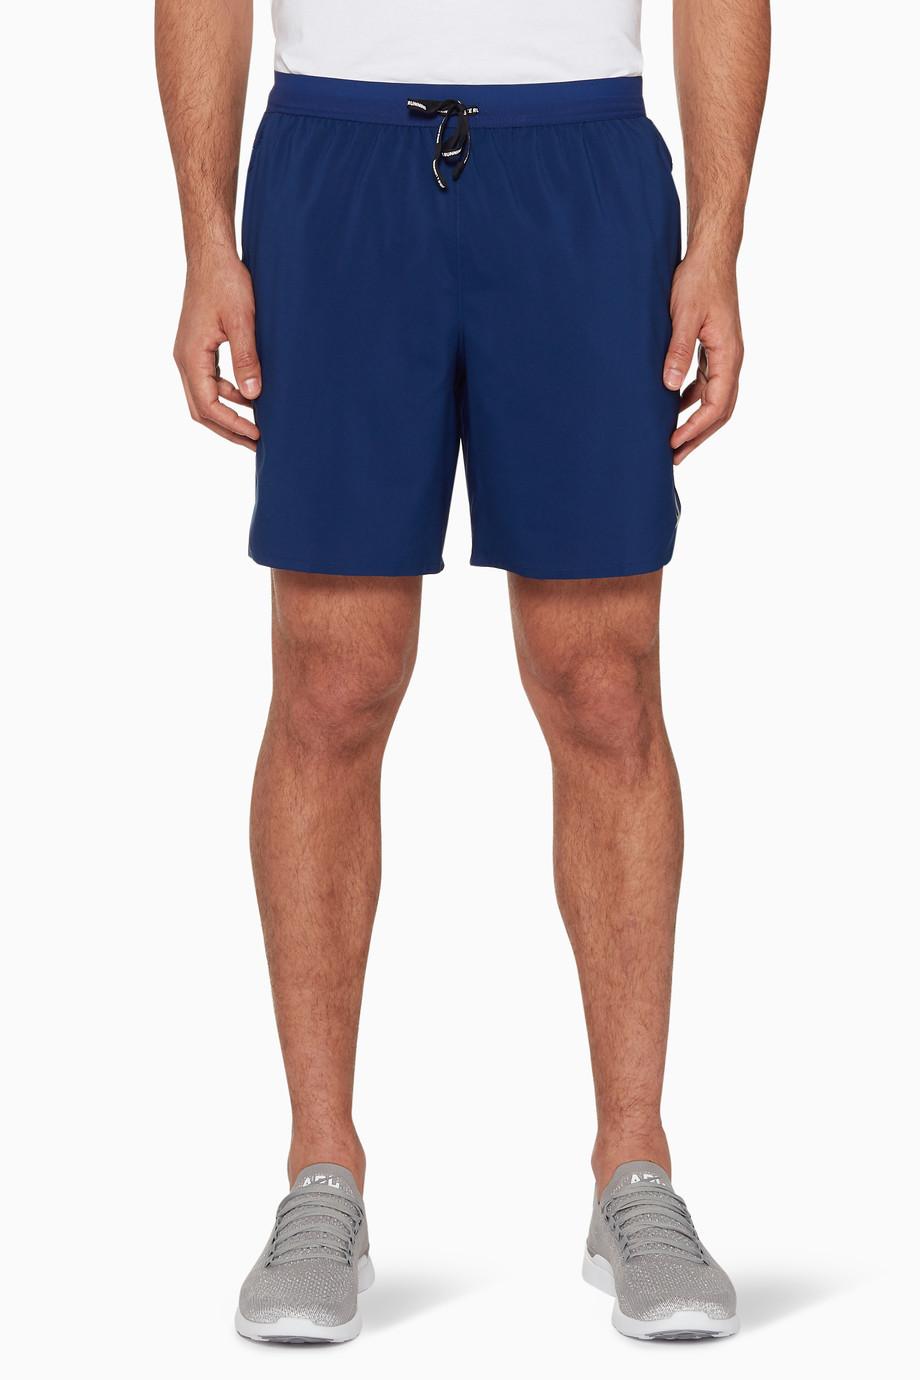 878f58f579fe0 Shop Nike Blue Blue Flex Stride Running Shorts for Men